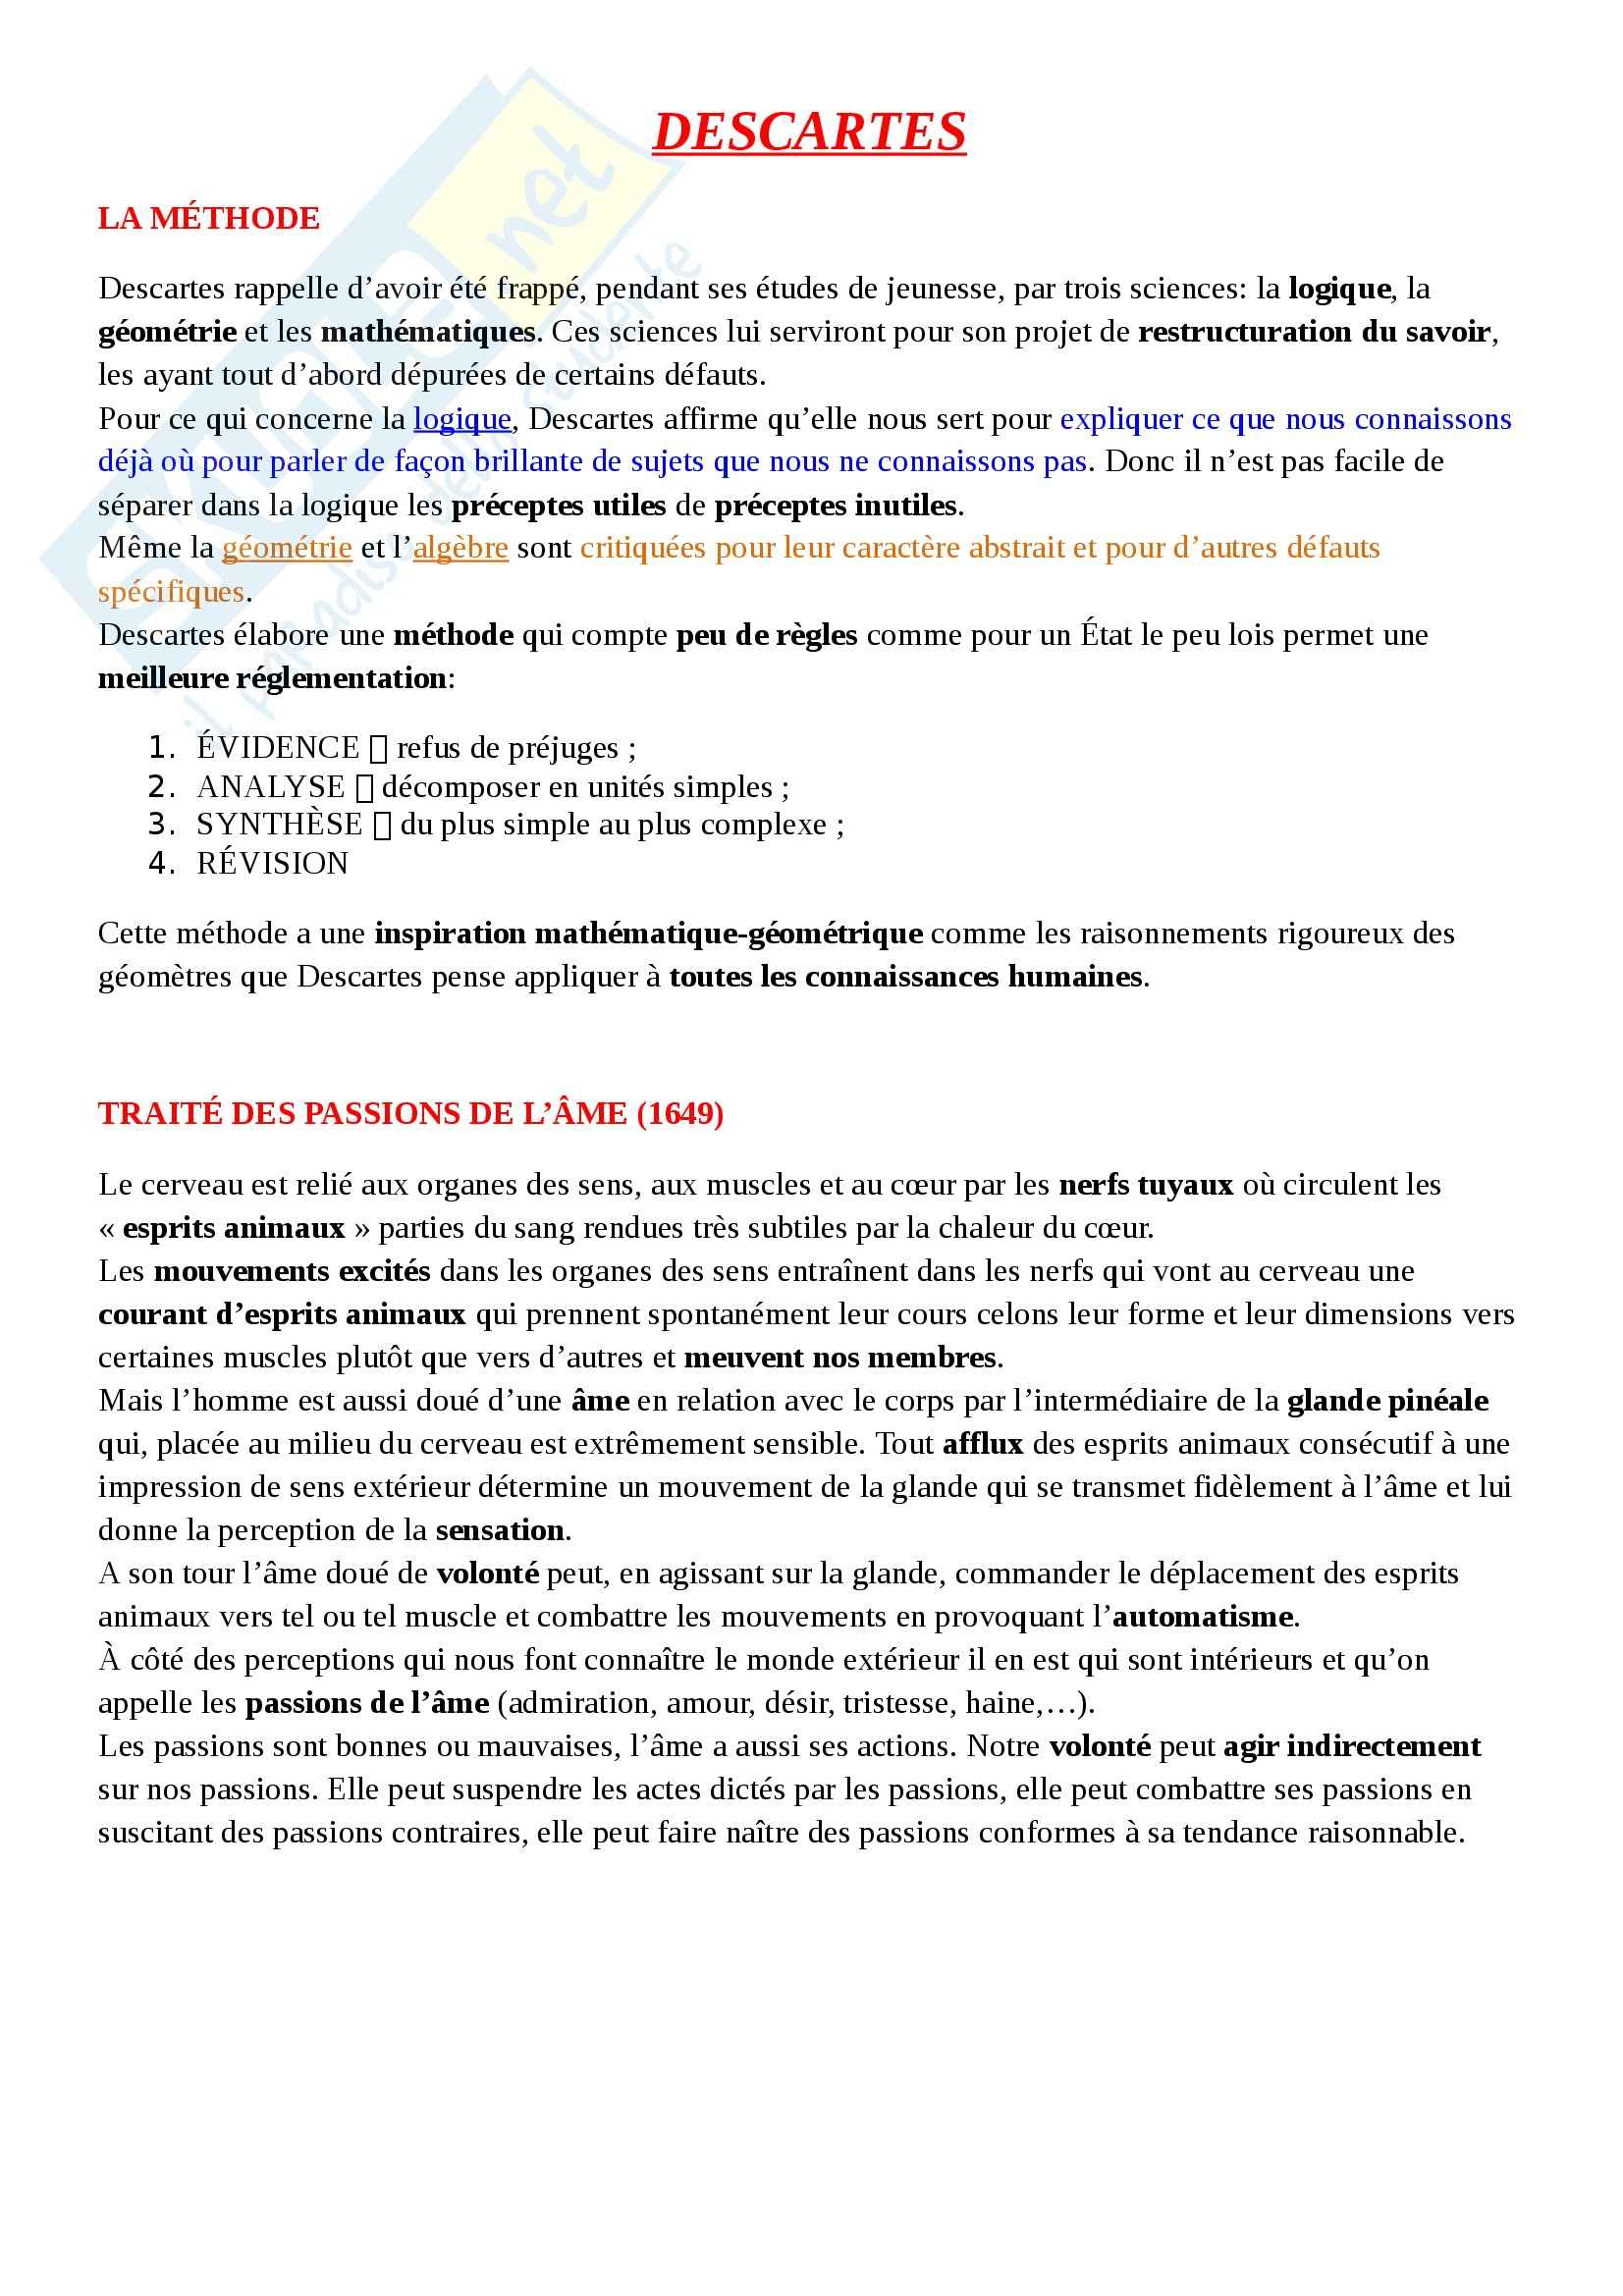 Letteratura francese - Descartes